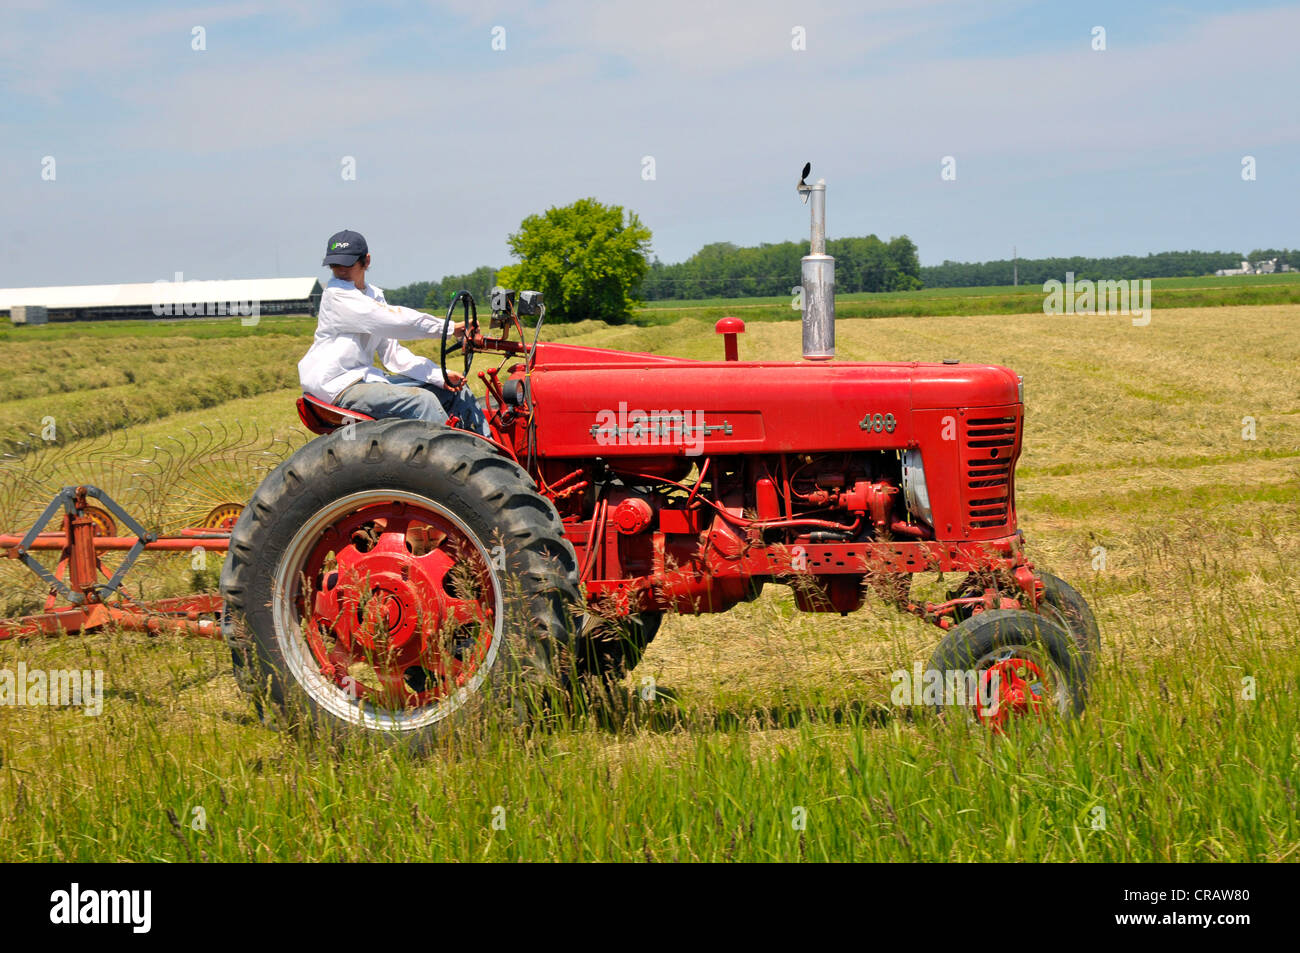 Farmer On Tractor : Farmer on tractor raking hay for animal feed stock photo